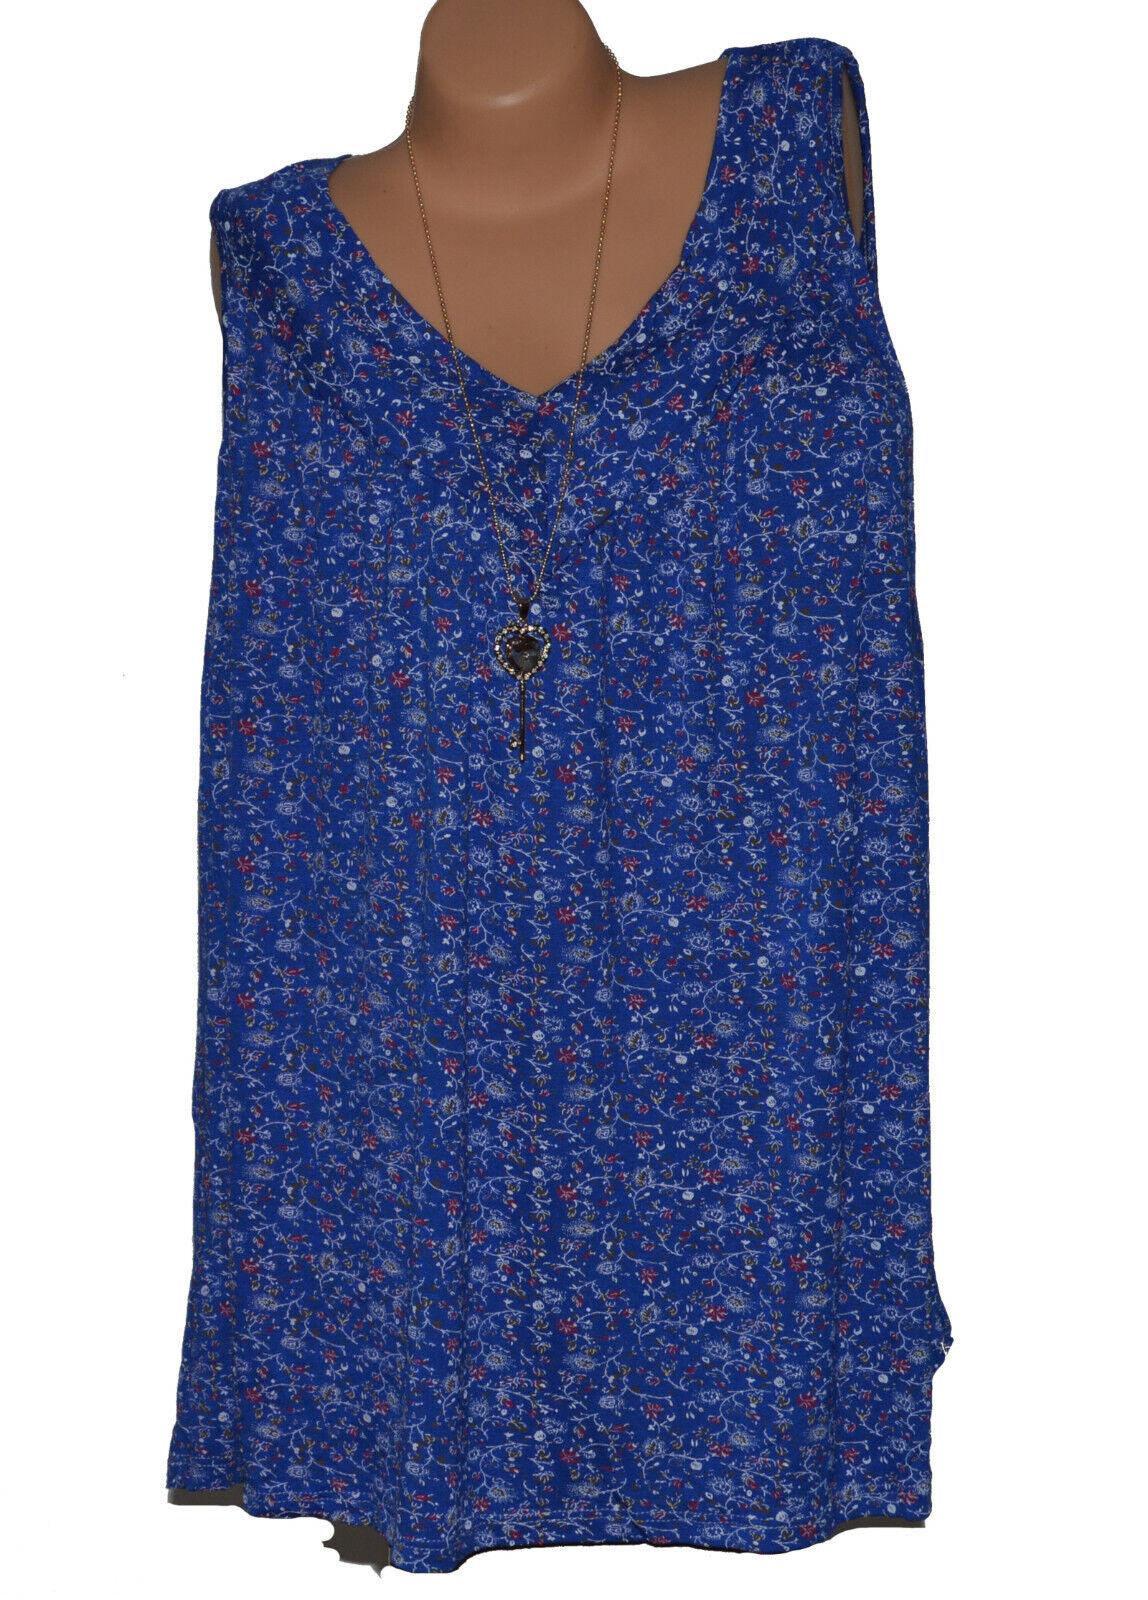 Italy Moda Tunika Shirt Top Bluse Überröße 44 46 48 50 52 N°66